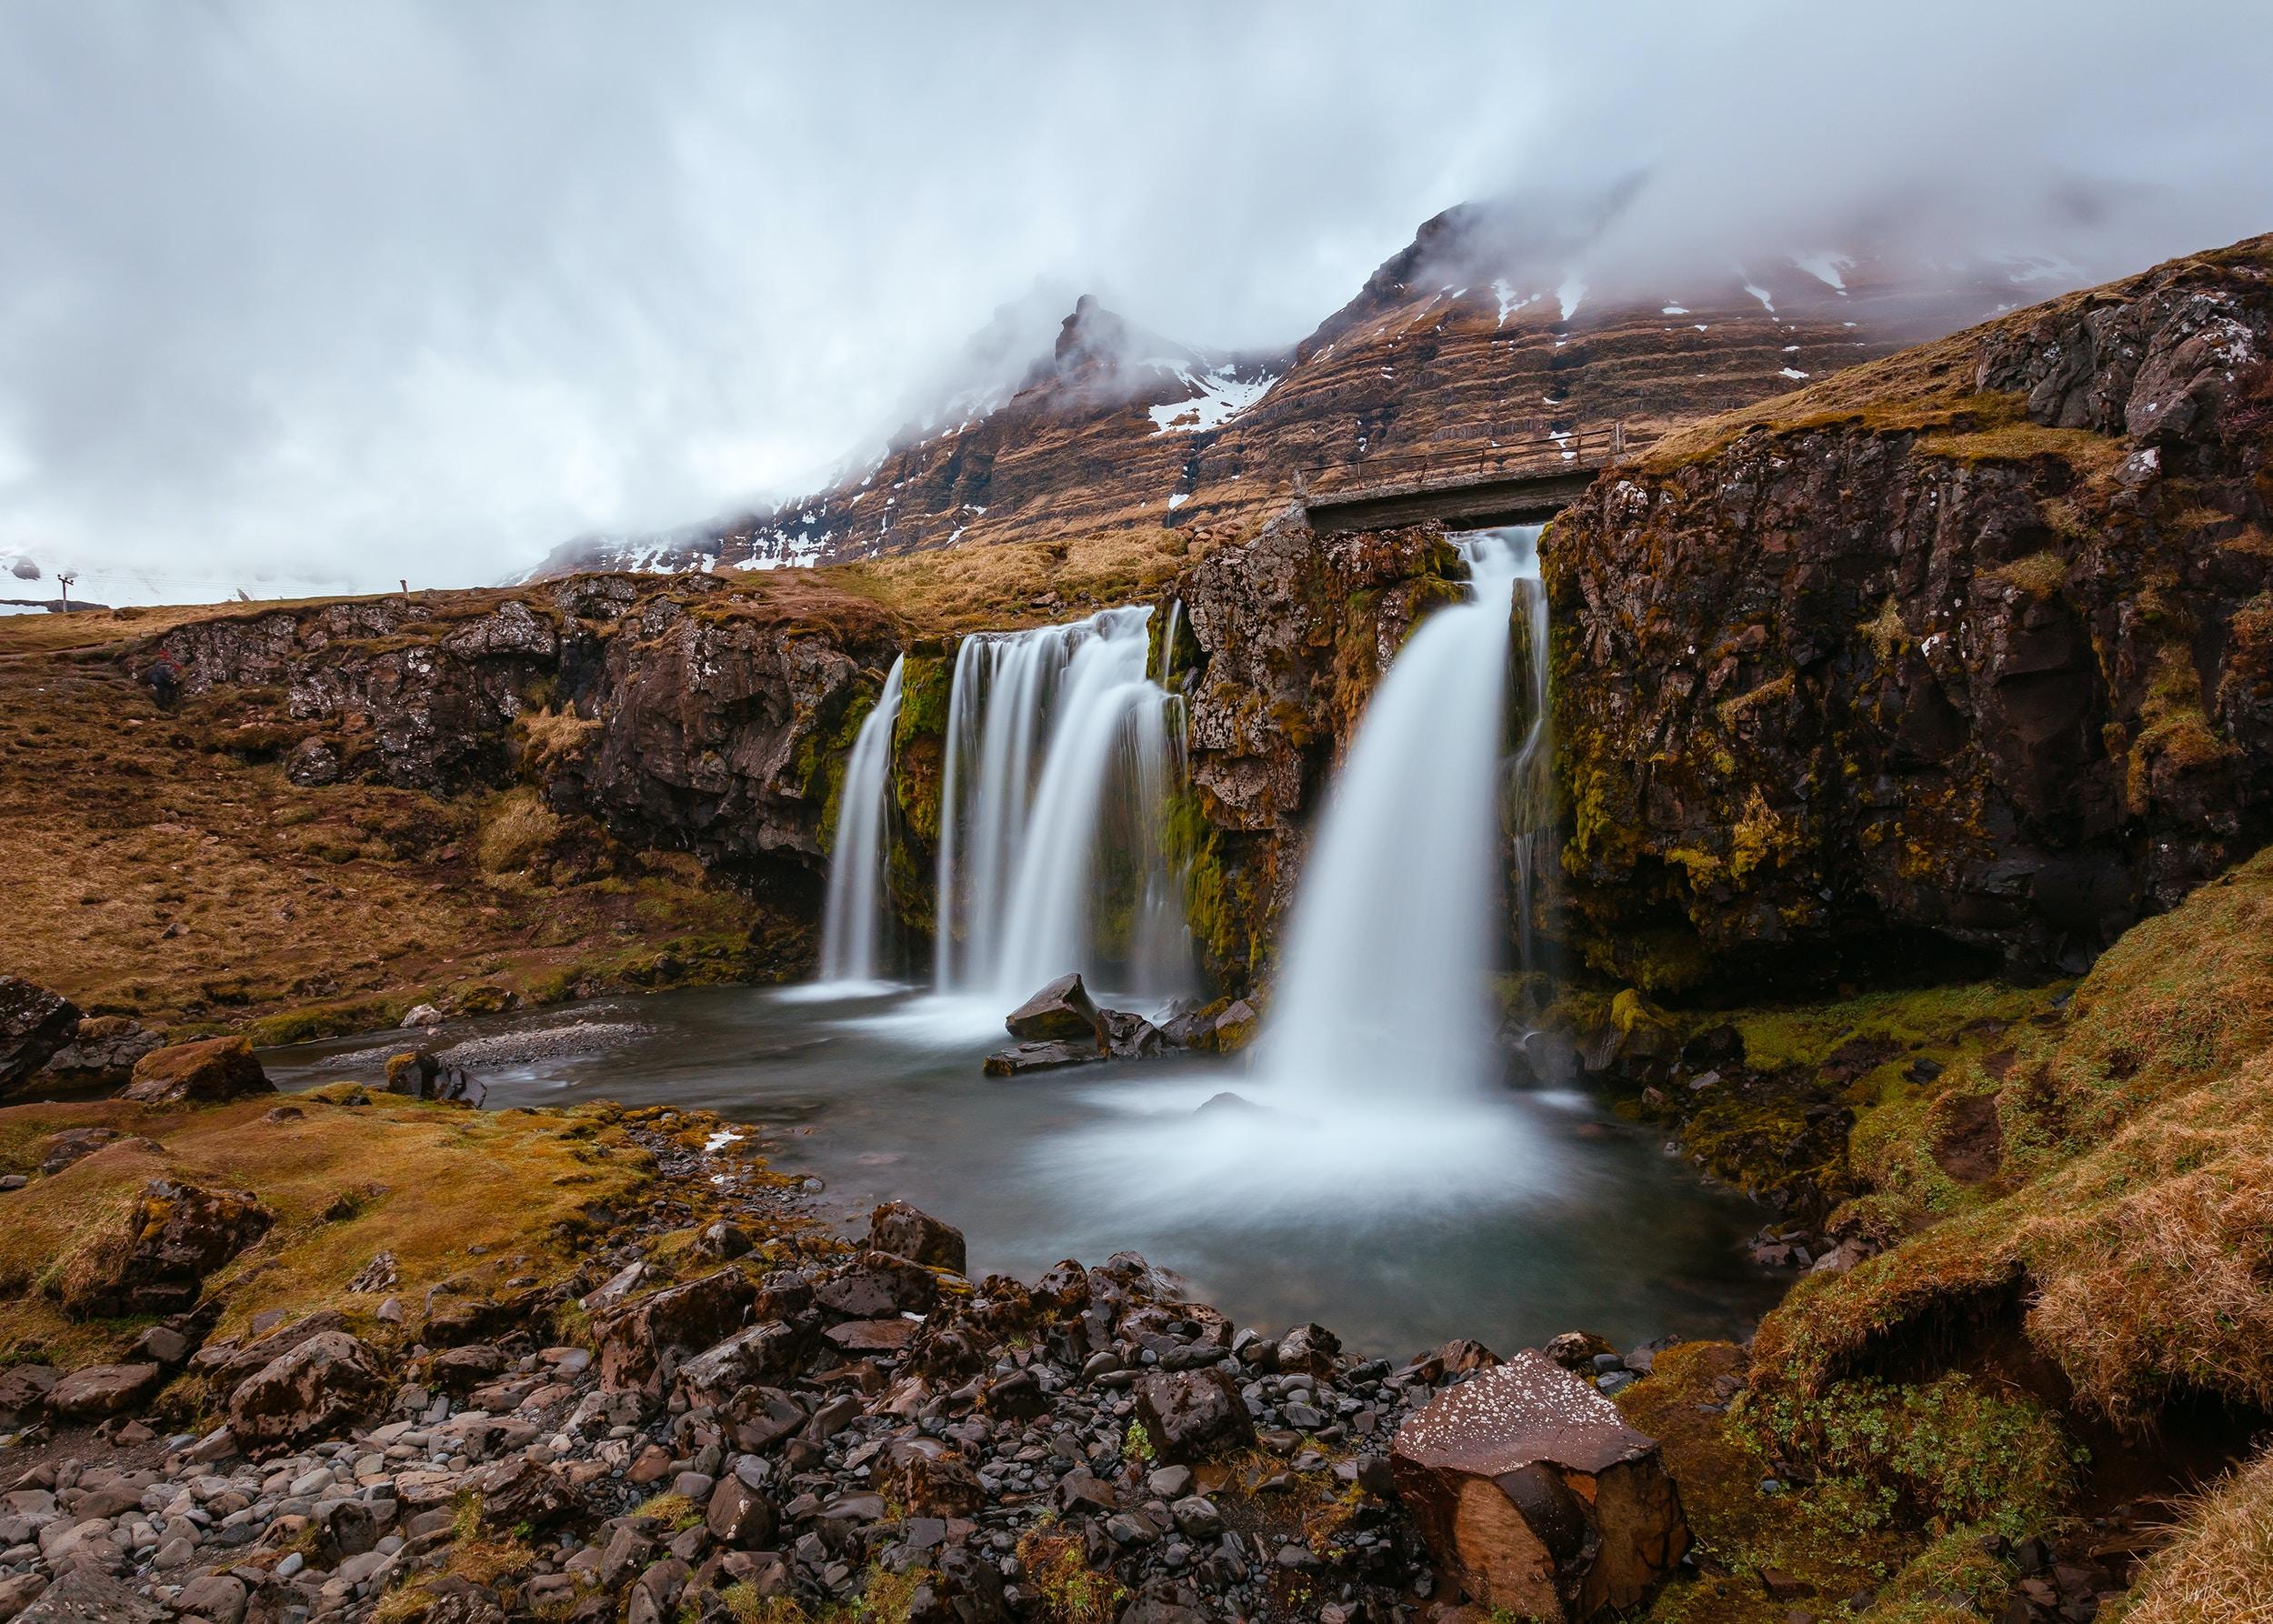 waterfalls surround brown cliff during daytime